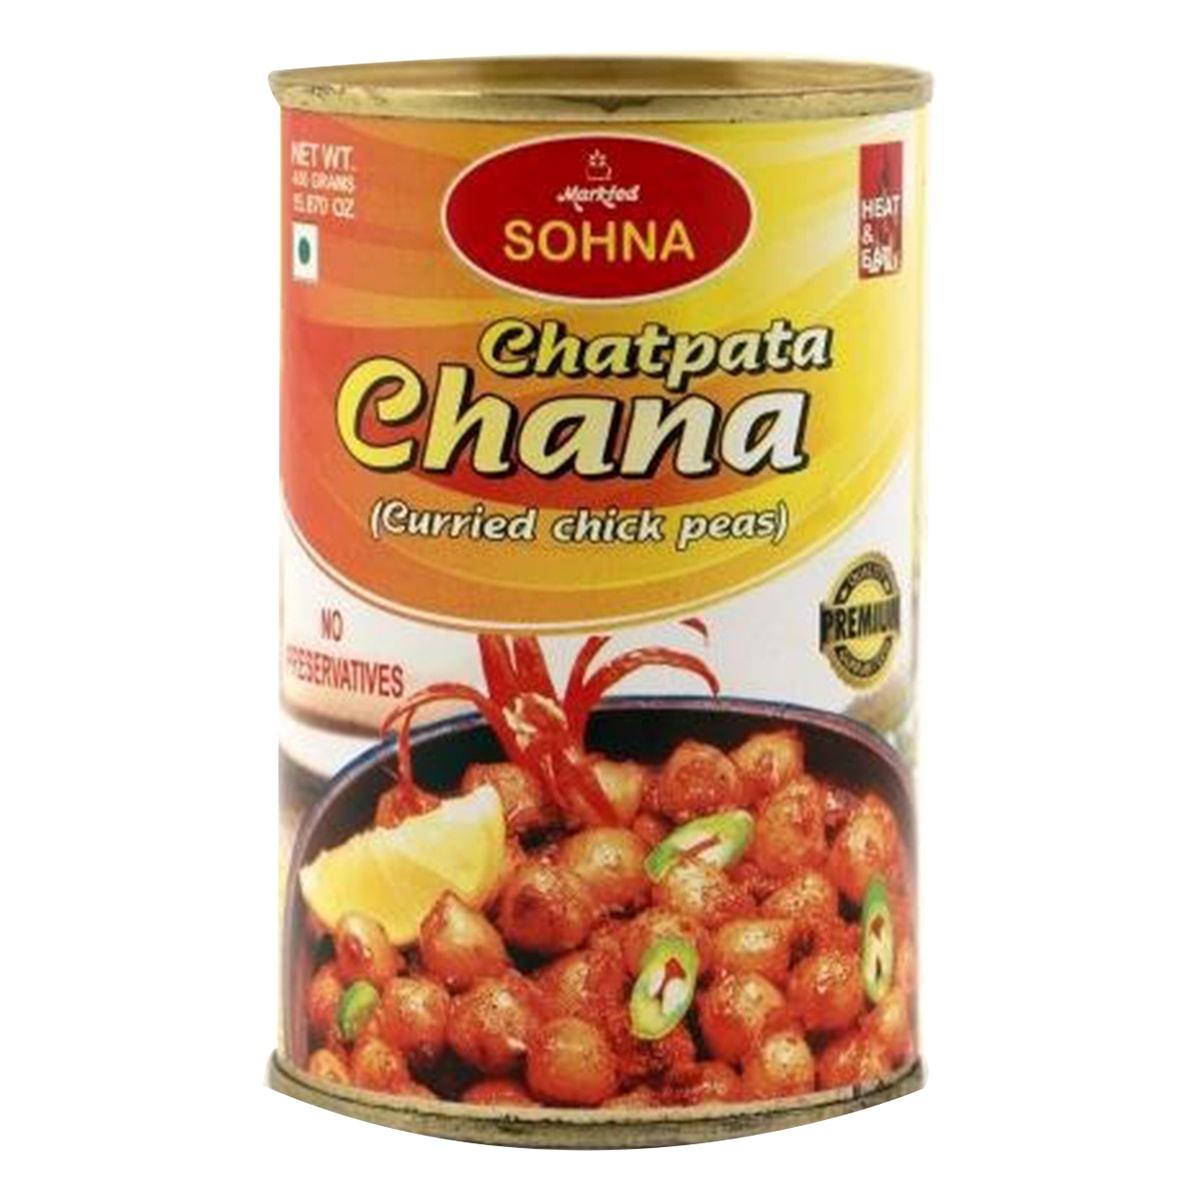 Buy Markfed Sohna Chatpata Chana (Chick Peas Curried) - 450 gm